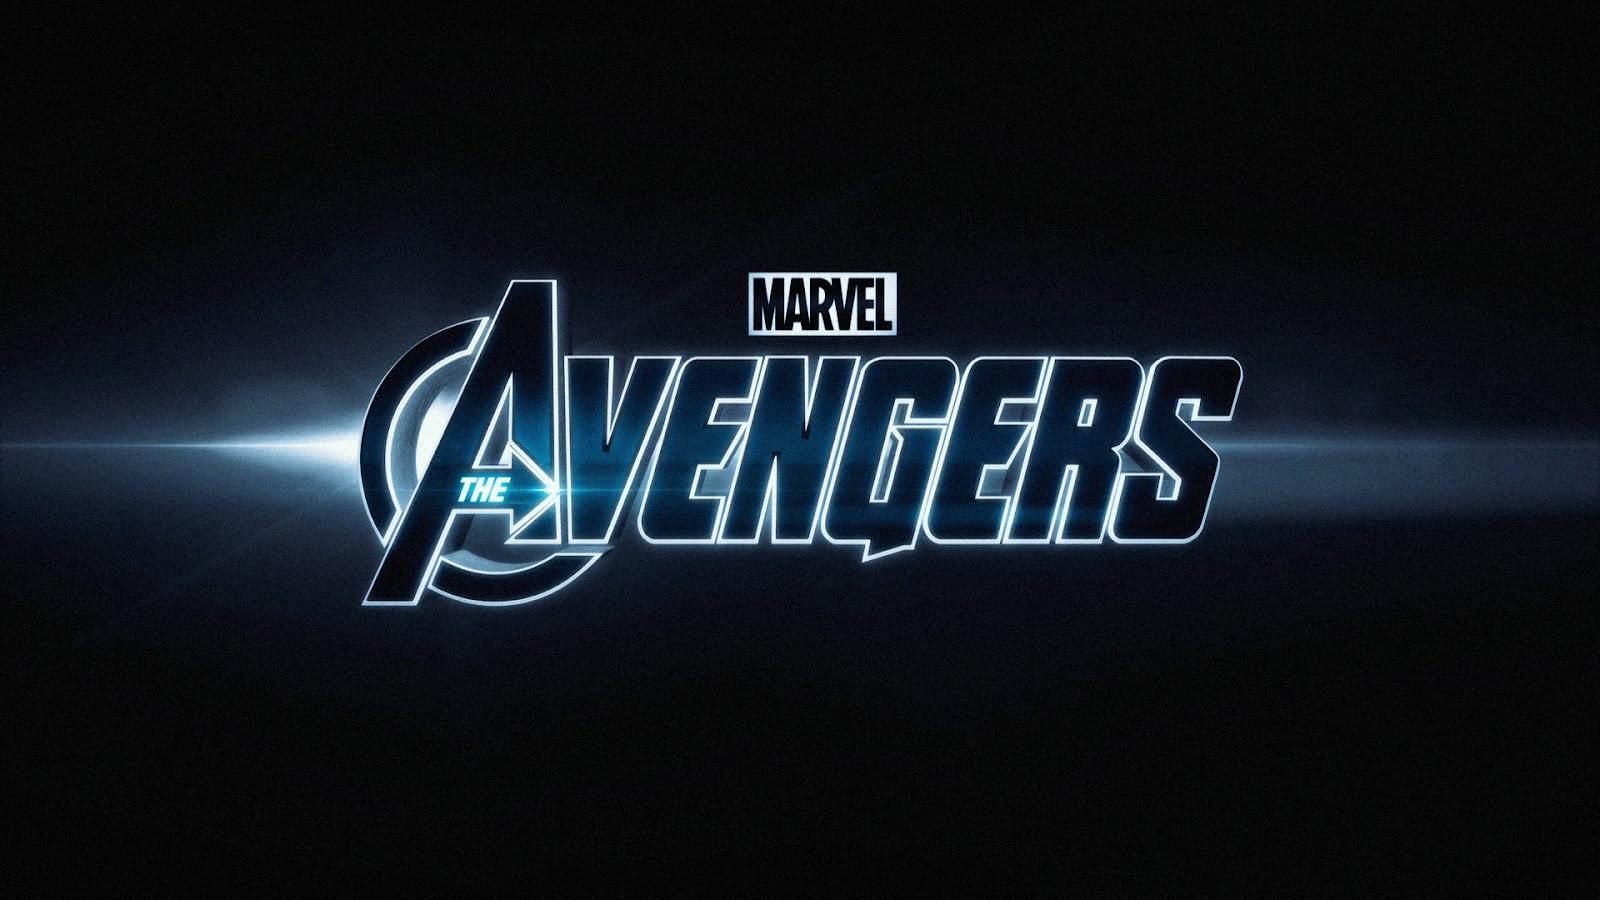 Avenger Wallpaper For Android: Avengers Movie HD Wallpapers